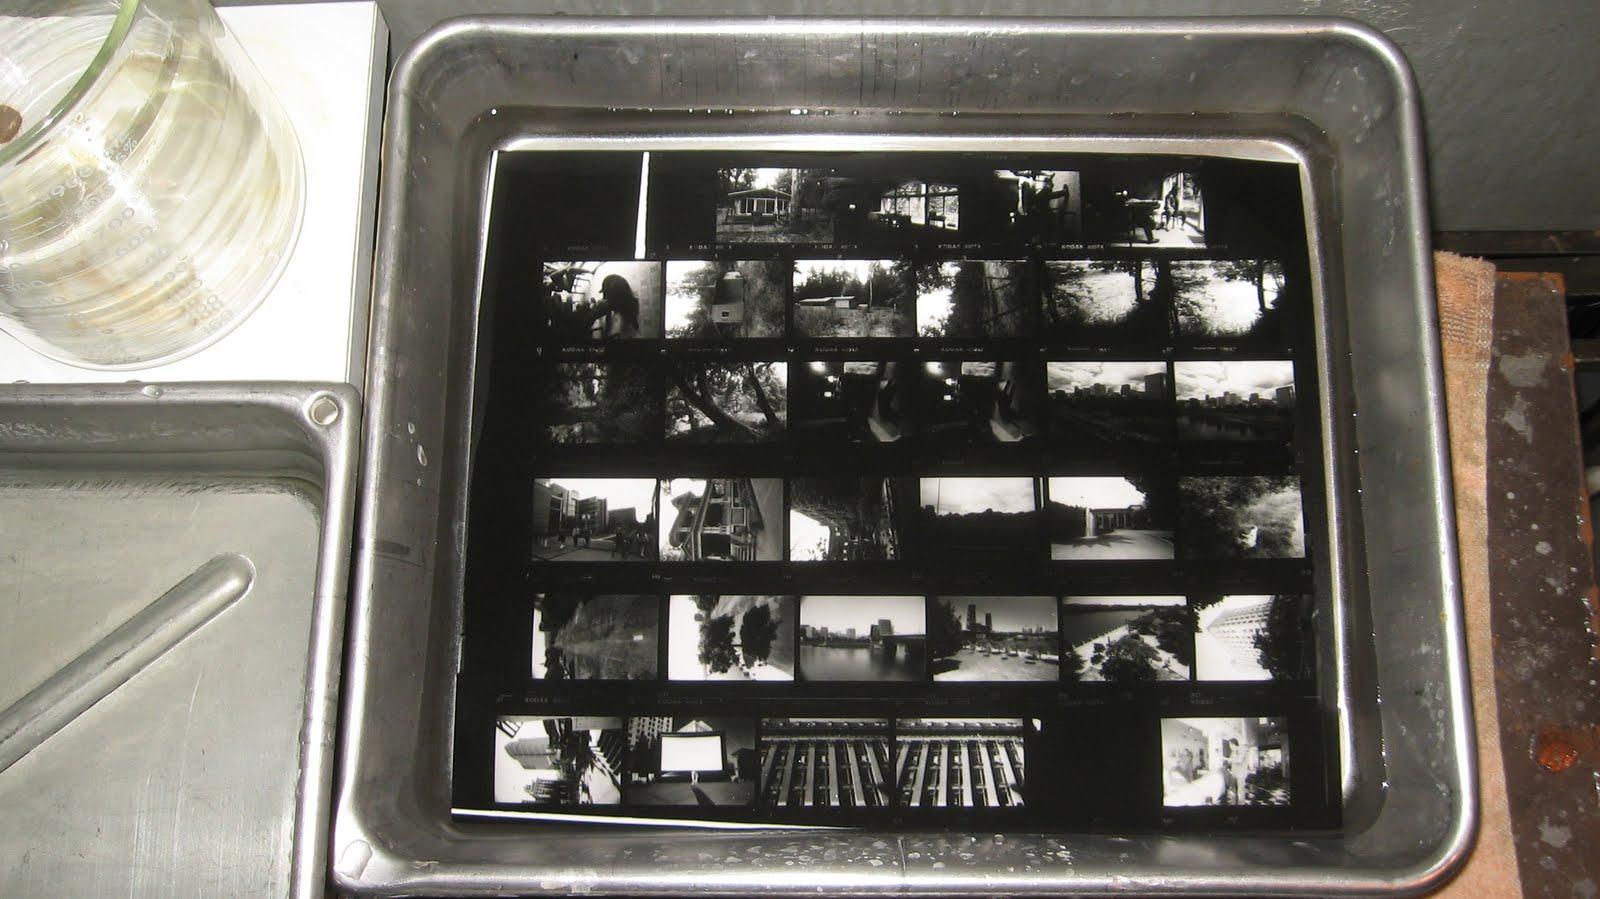 http://4.bp.blogspot.com/_lnbYoAP--7k/TEyPn0pqn4I/AAAAAAAAD8Y/ZJKZGR-8aKA/s1600/hc110+film+development+009.jpg